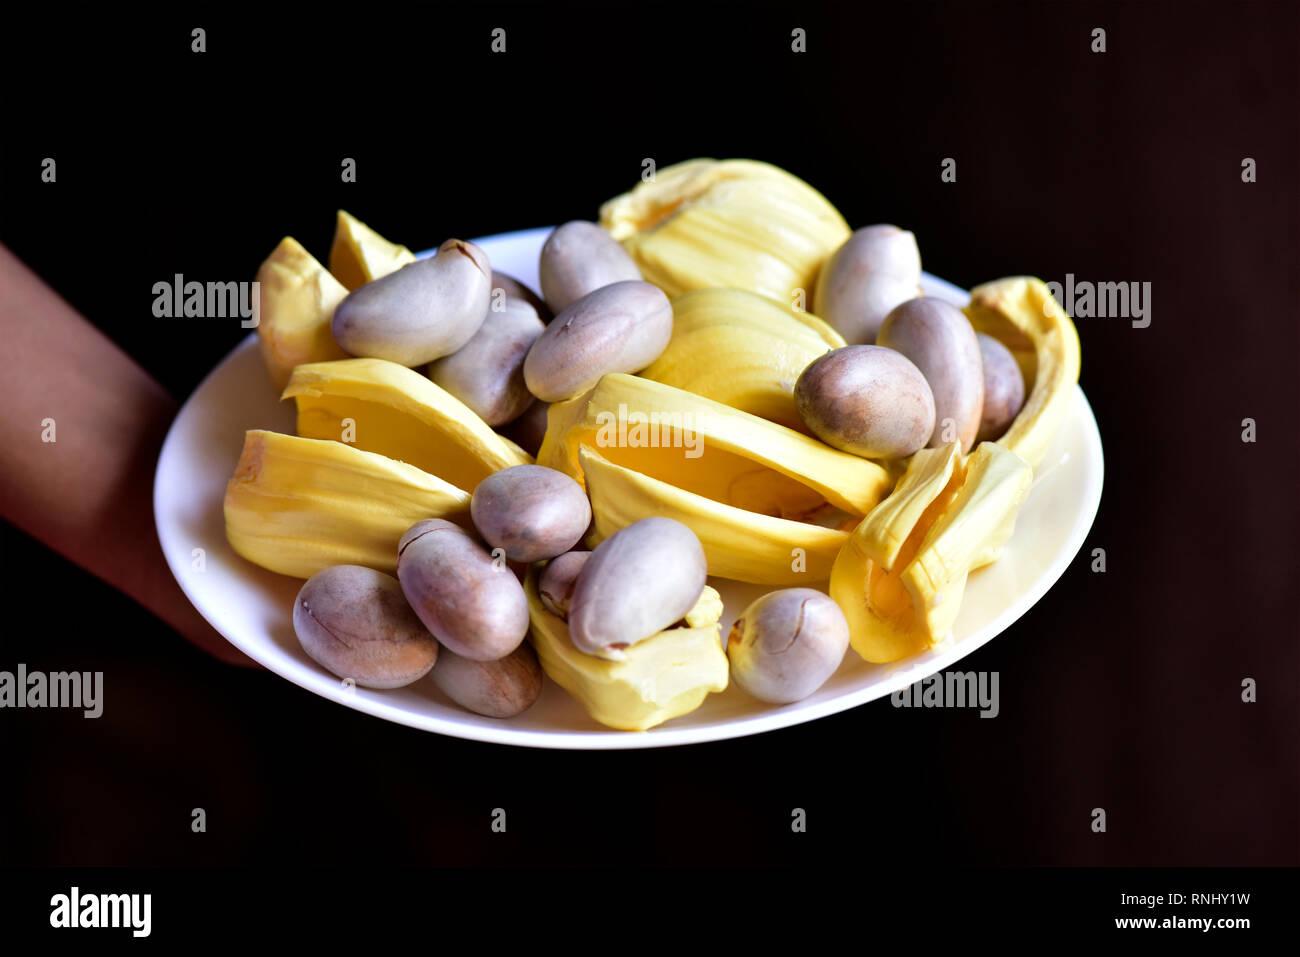 Malayalam Stock Photos & Malayalam Stock Images - Alamy